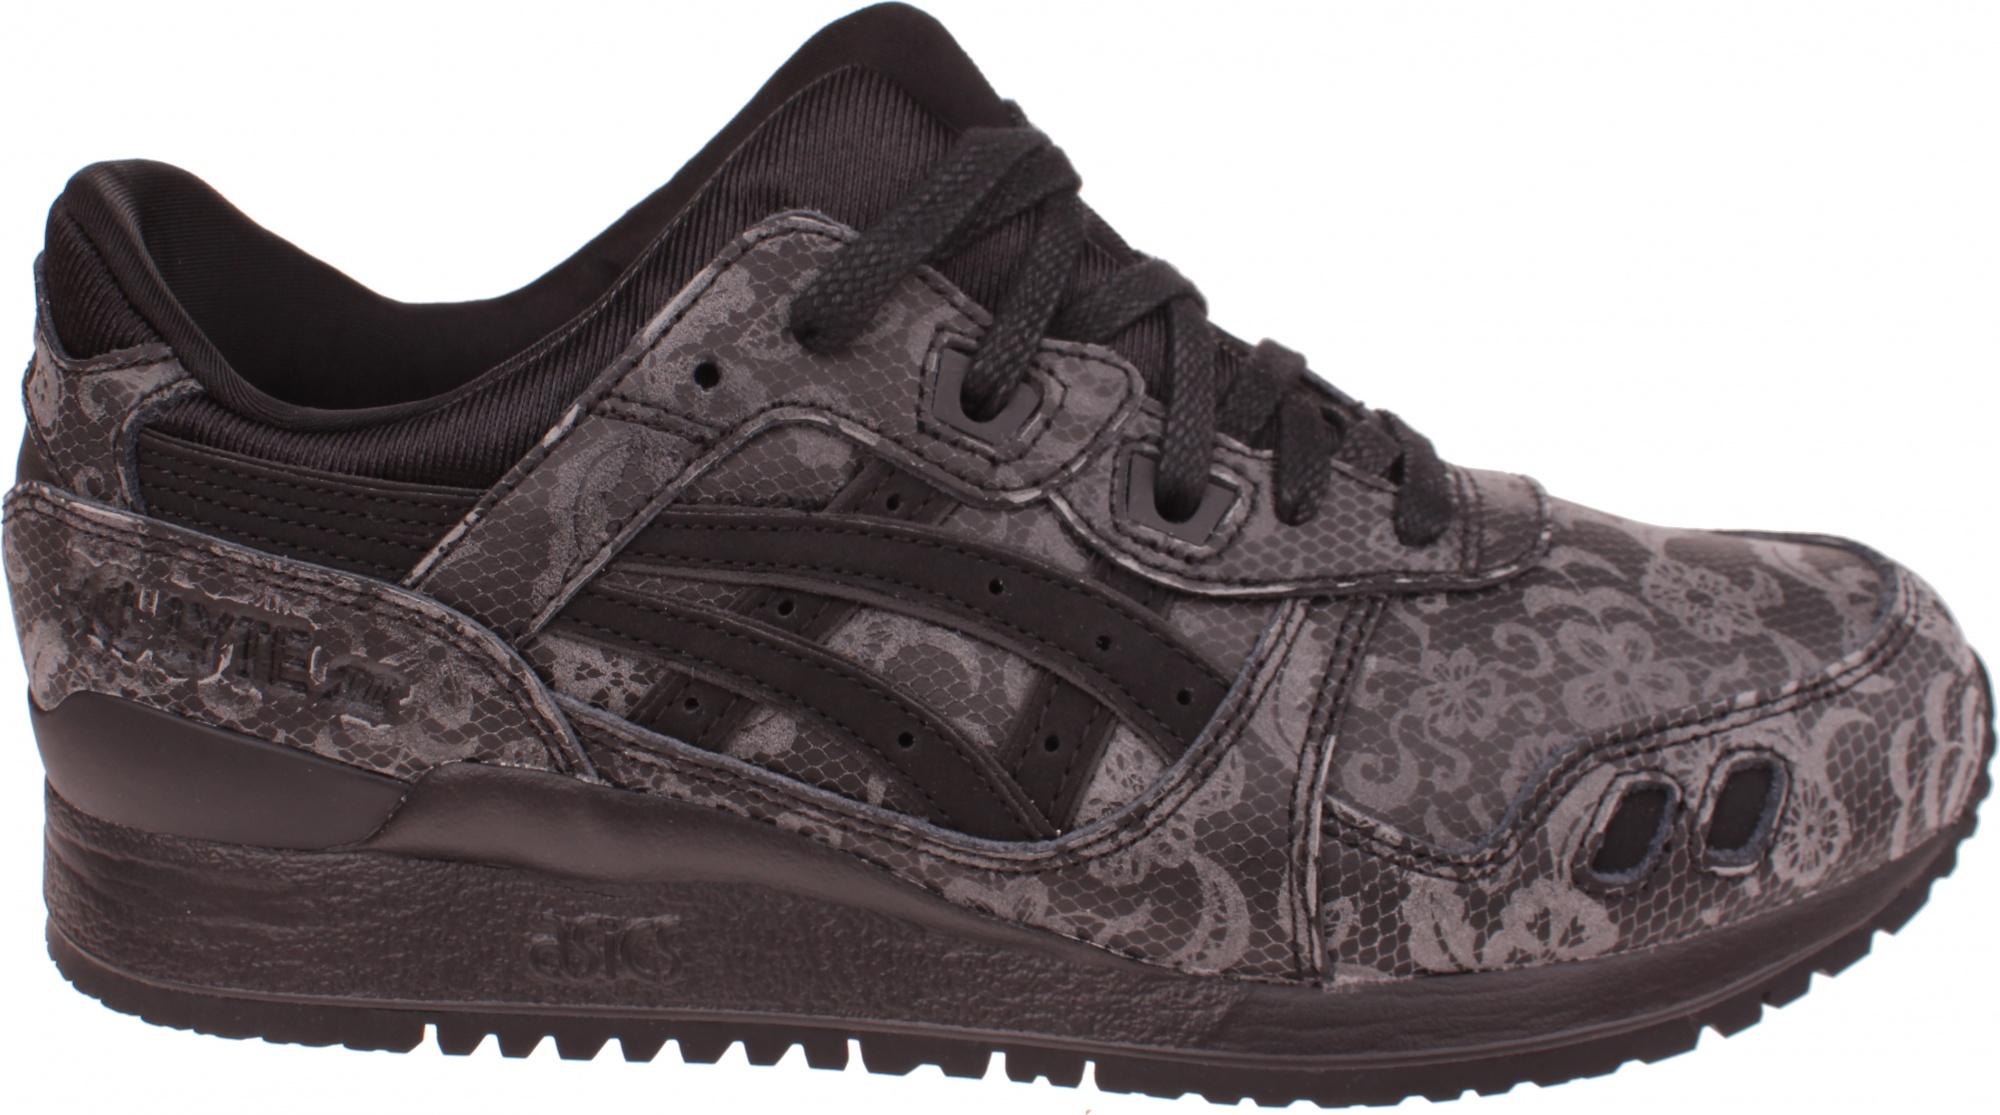 506acd21a9 ASICS sneakers Gel-Lyte III ladies black - Internet-Sport&Casuals